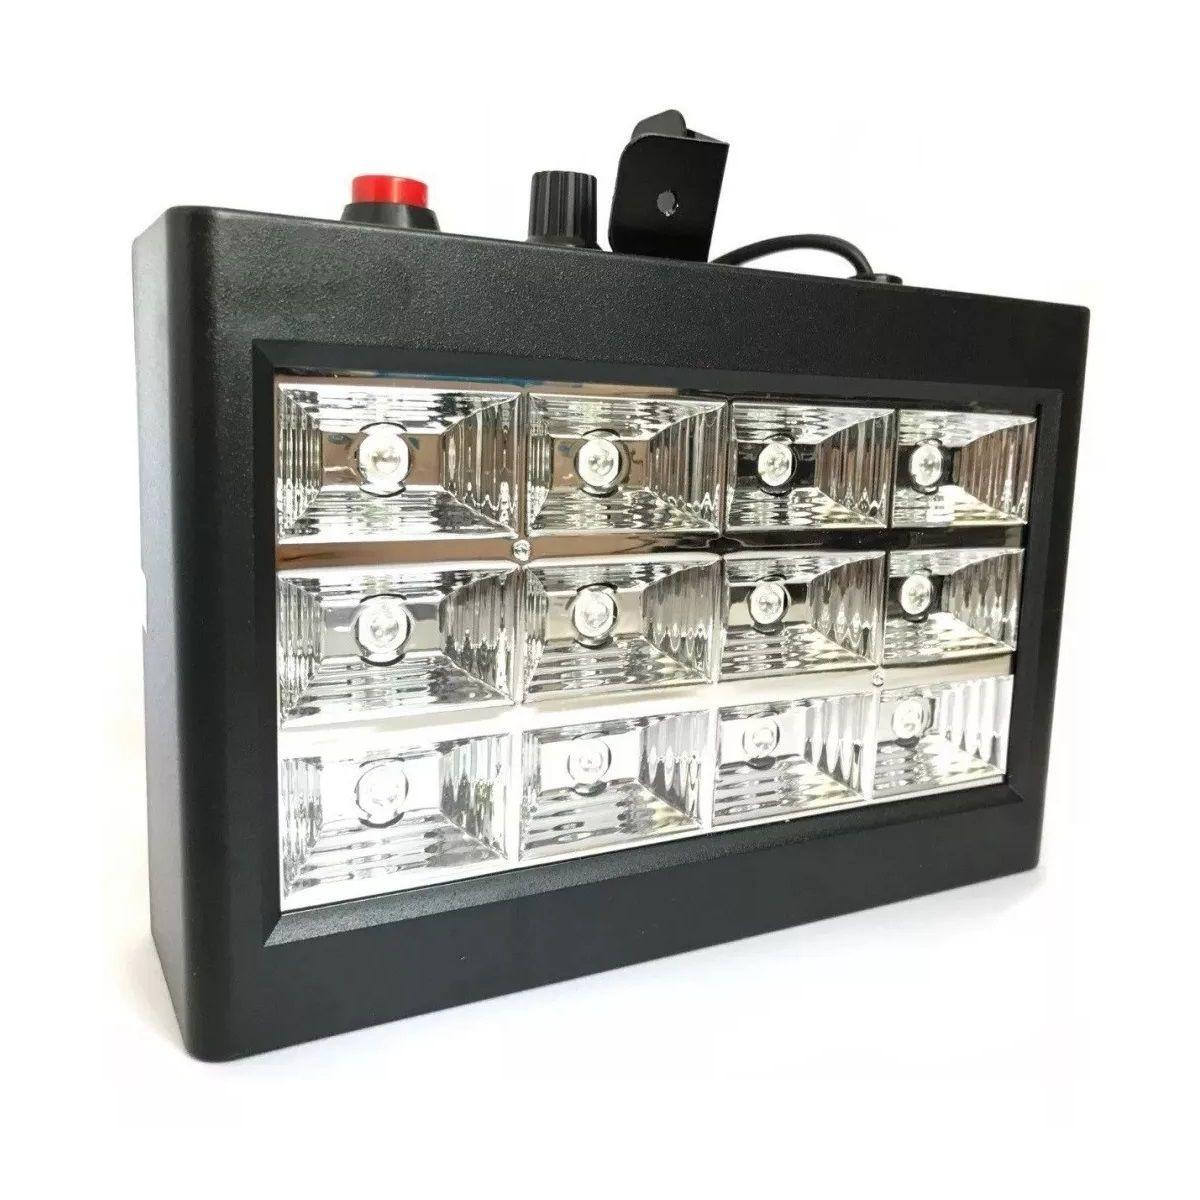 Strobo 12 Leds RGB 15W Rítmico Bivolt Automático - YX-043RGB